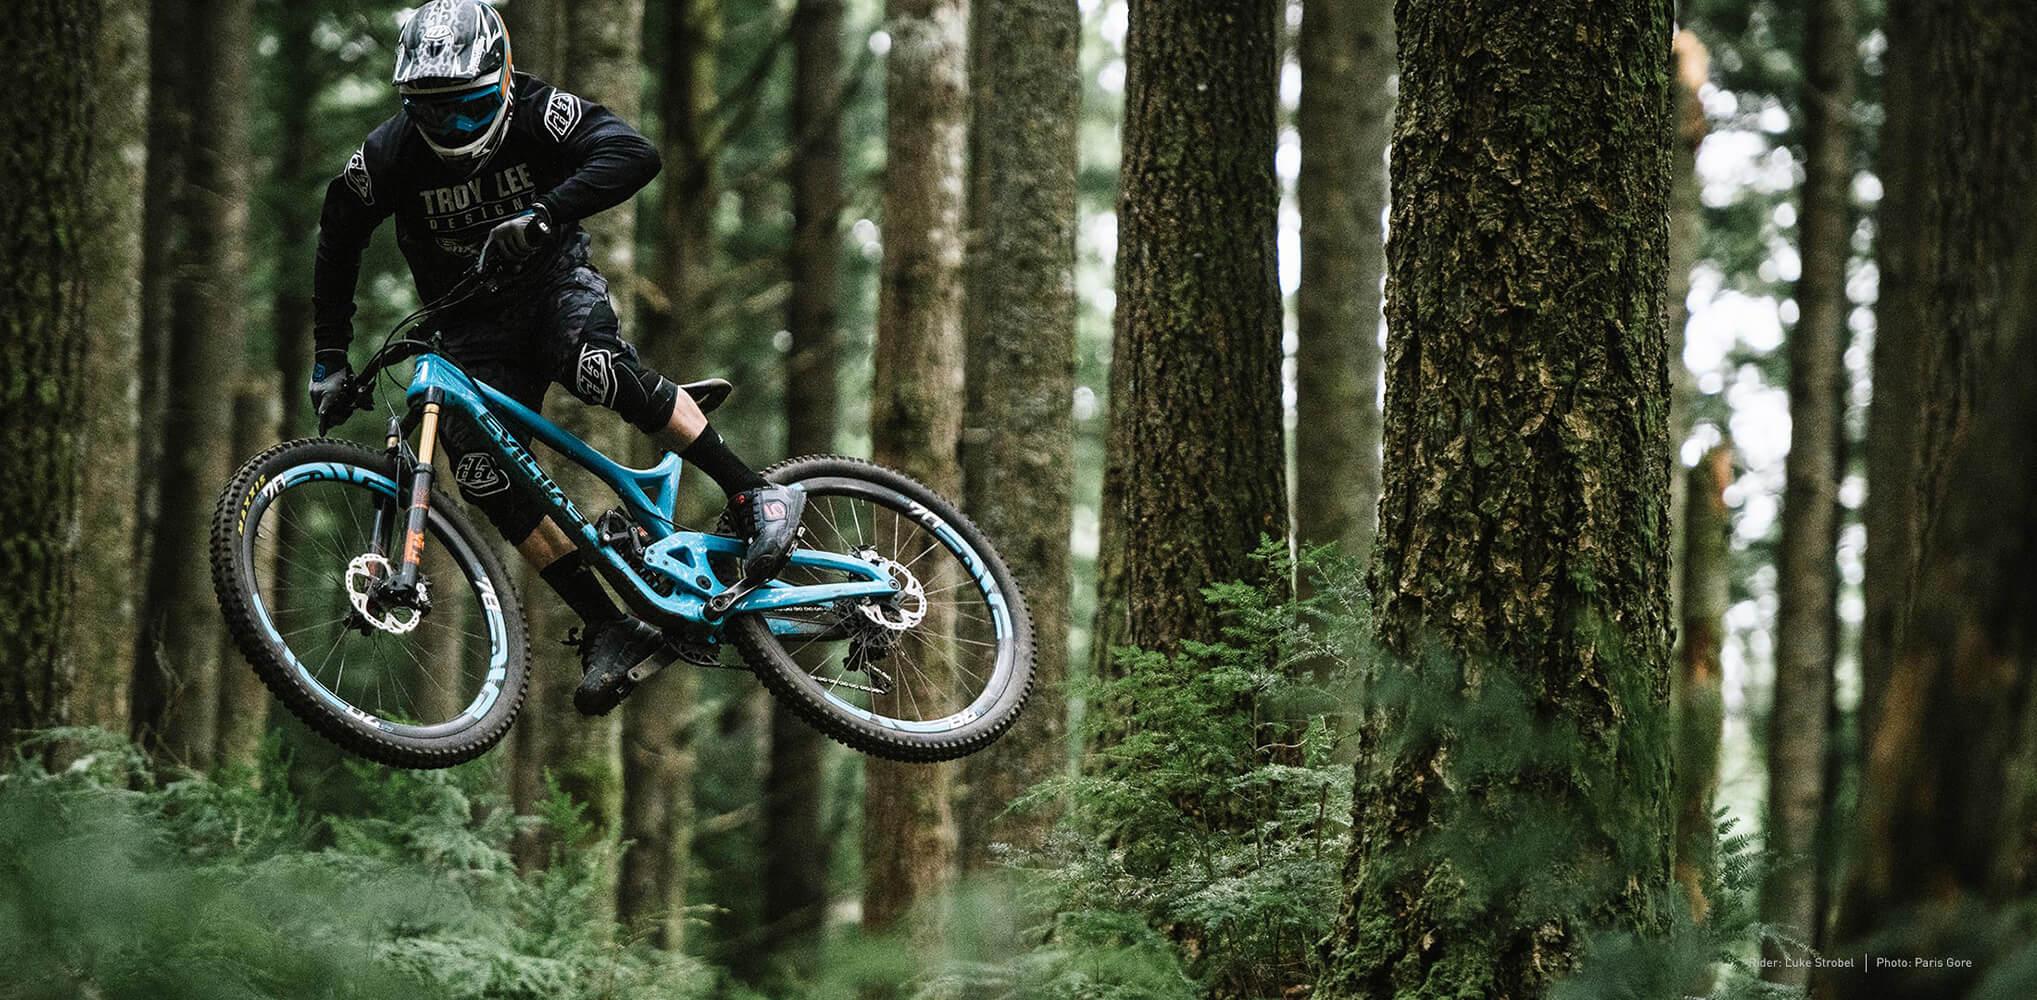 3 Mountain Biking Trends For 2018